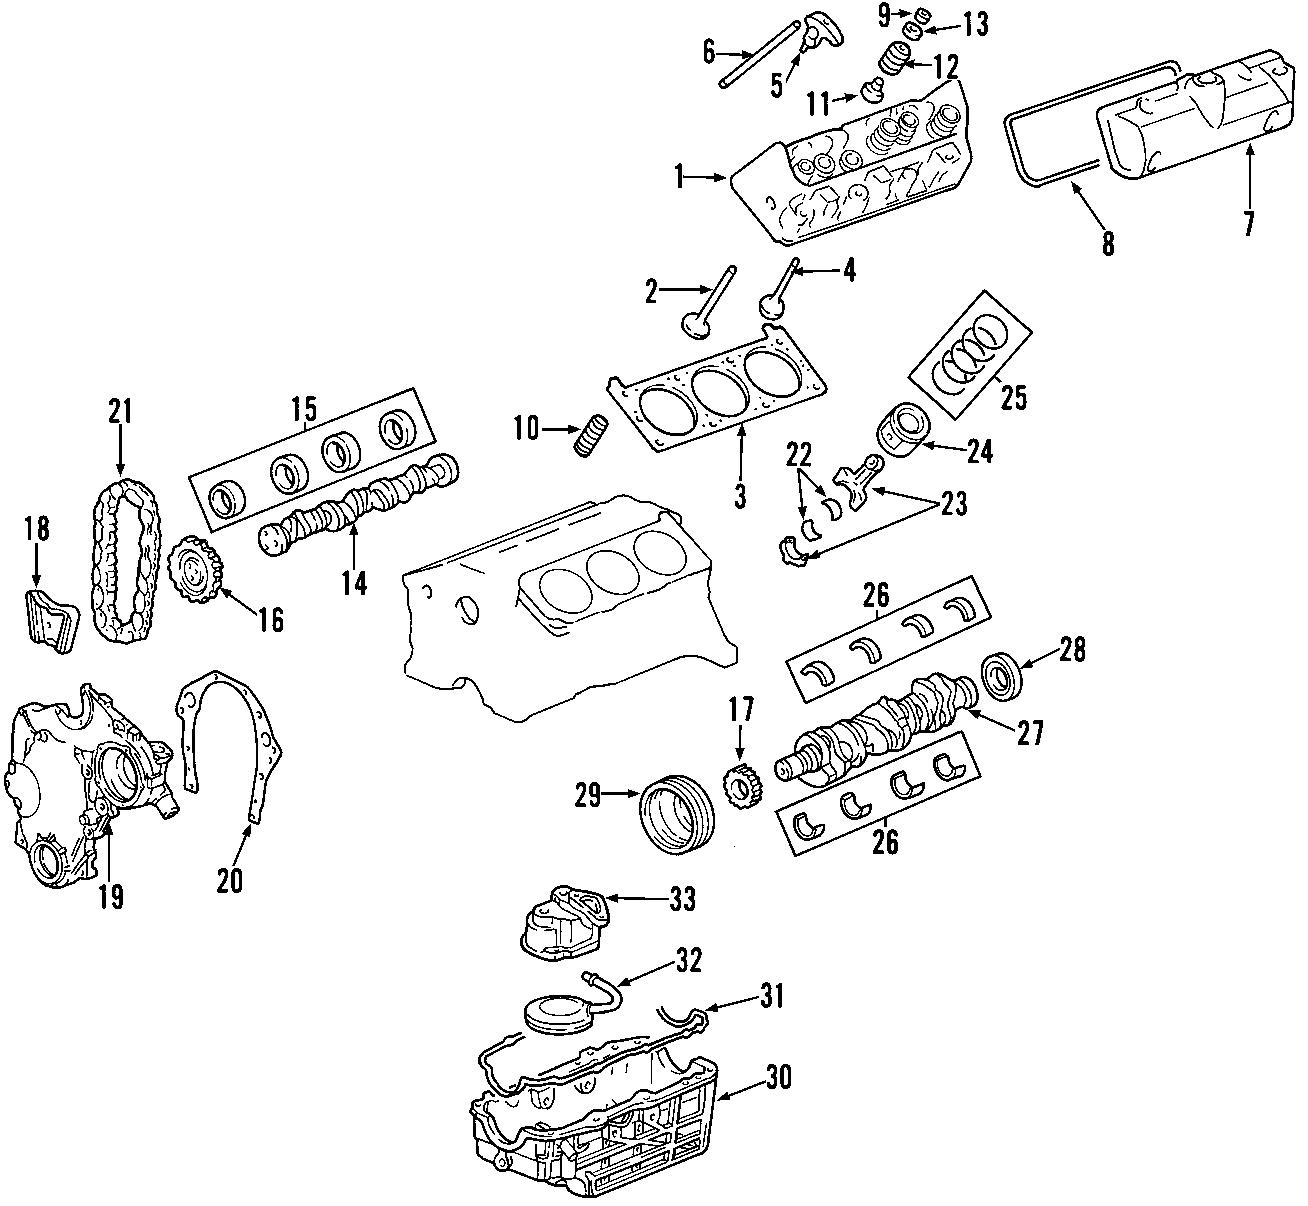 Chevrolet Monte Carlo Automatic Transmission Mount